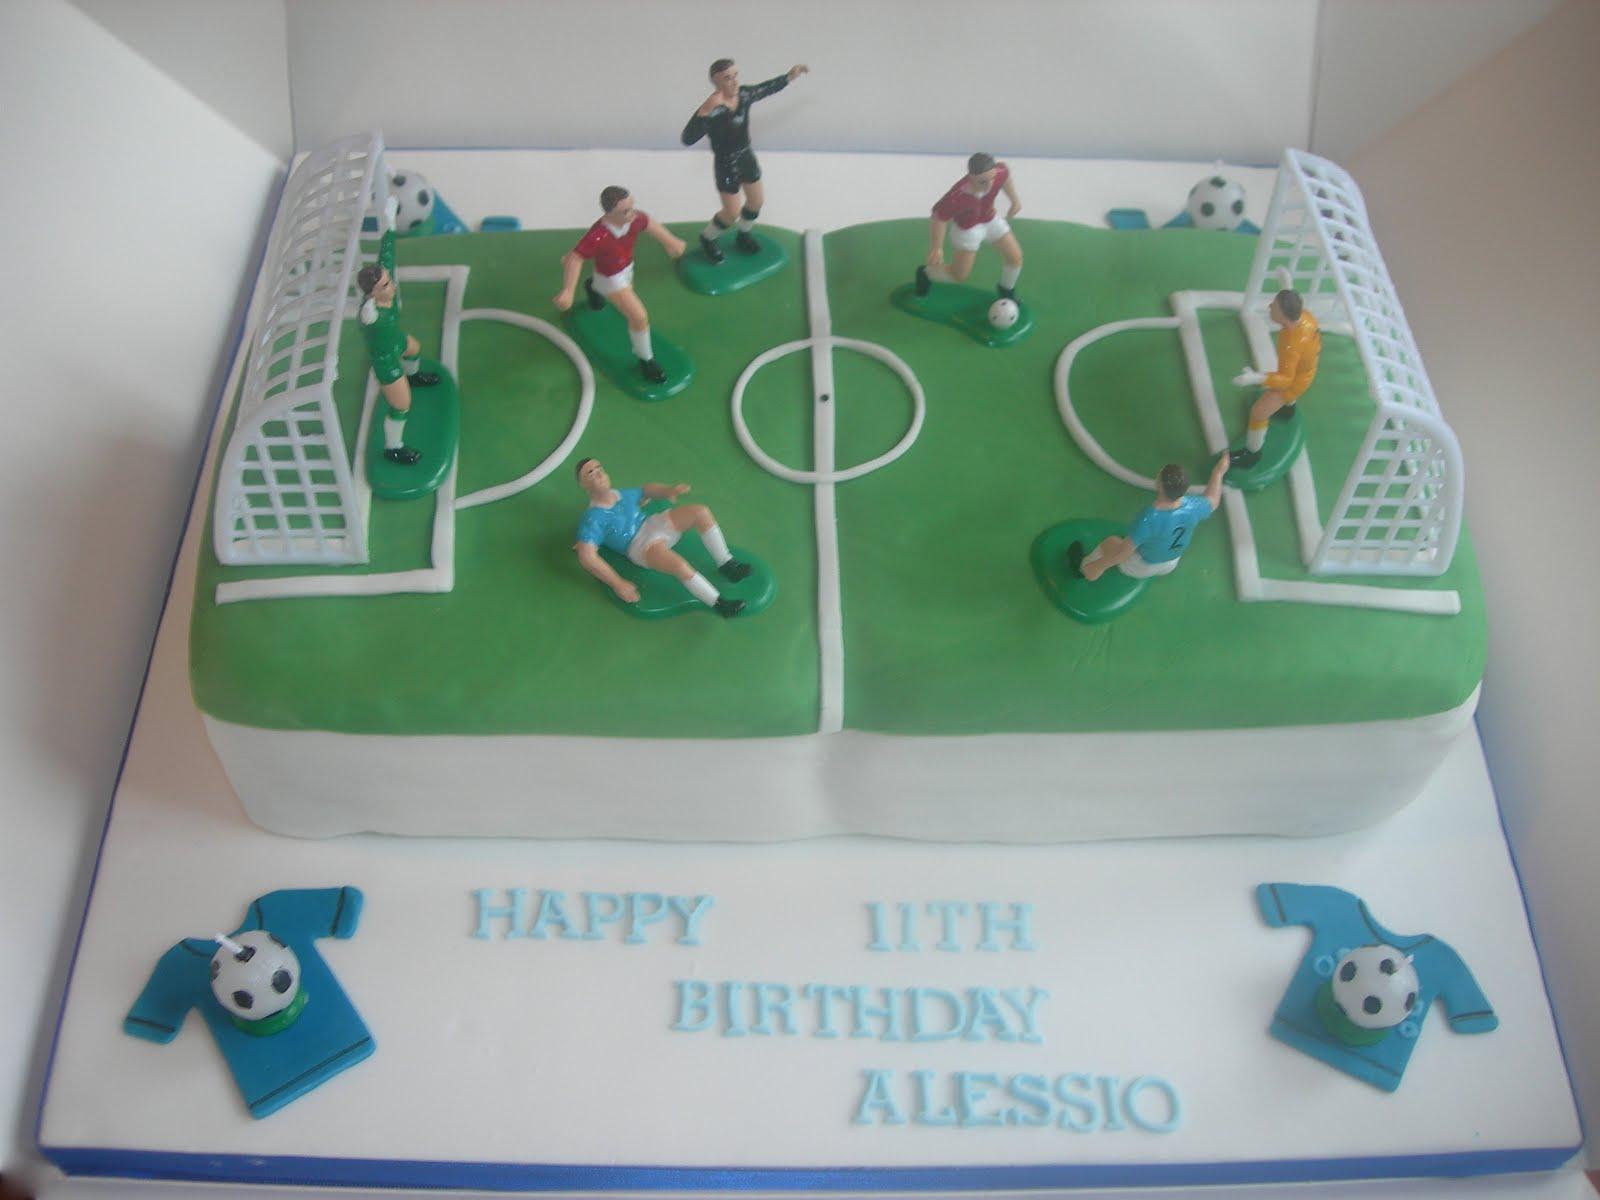 Custom Cake Designs Uk : Custom Cake Design: Football cake